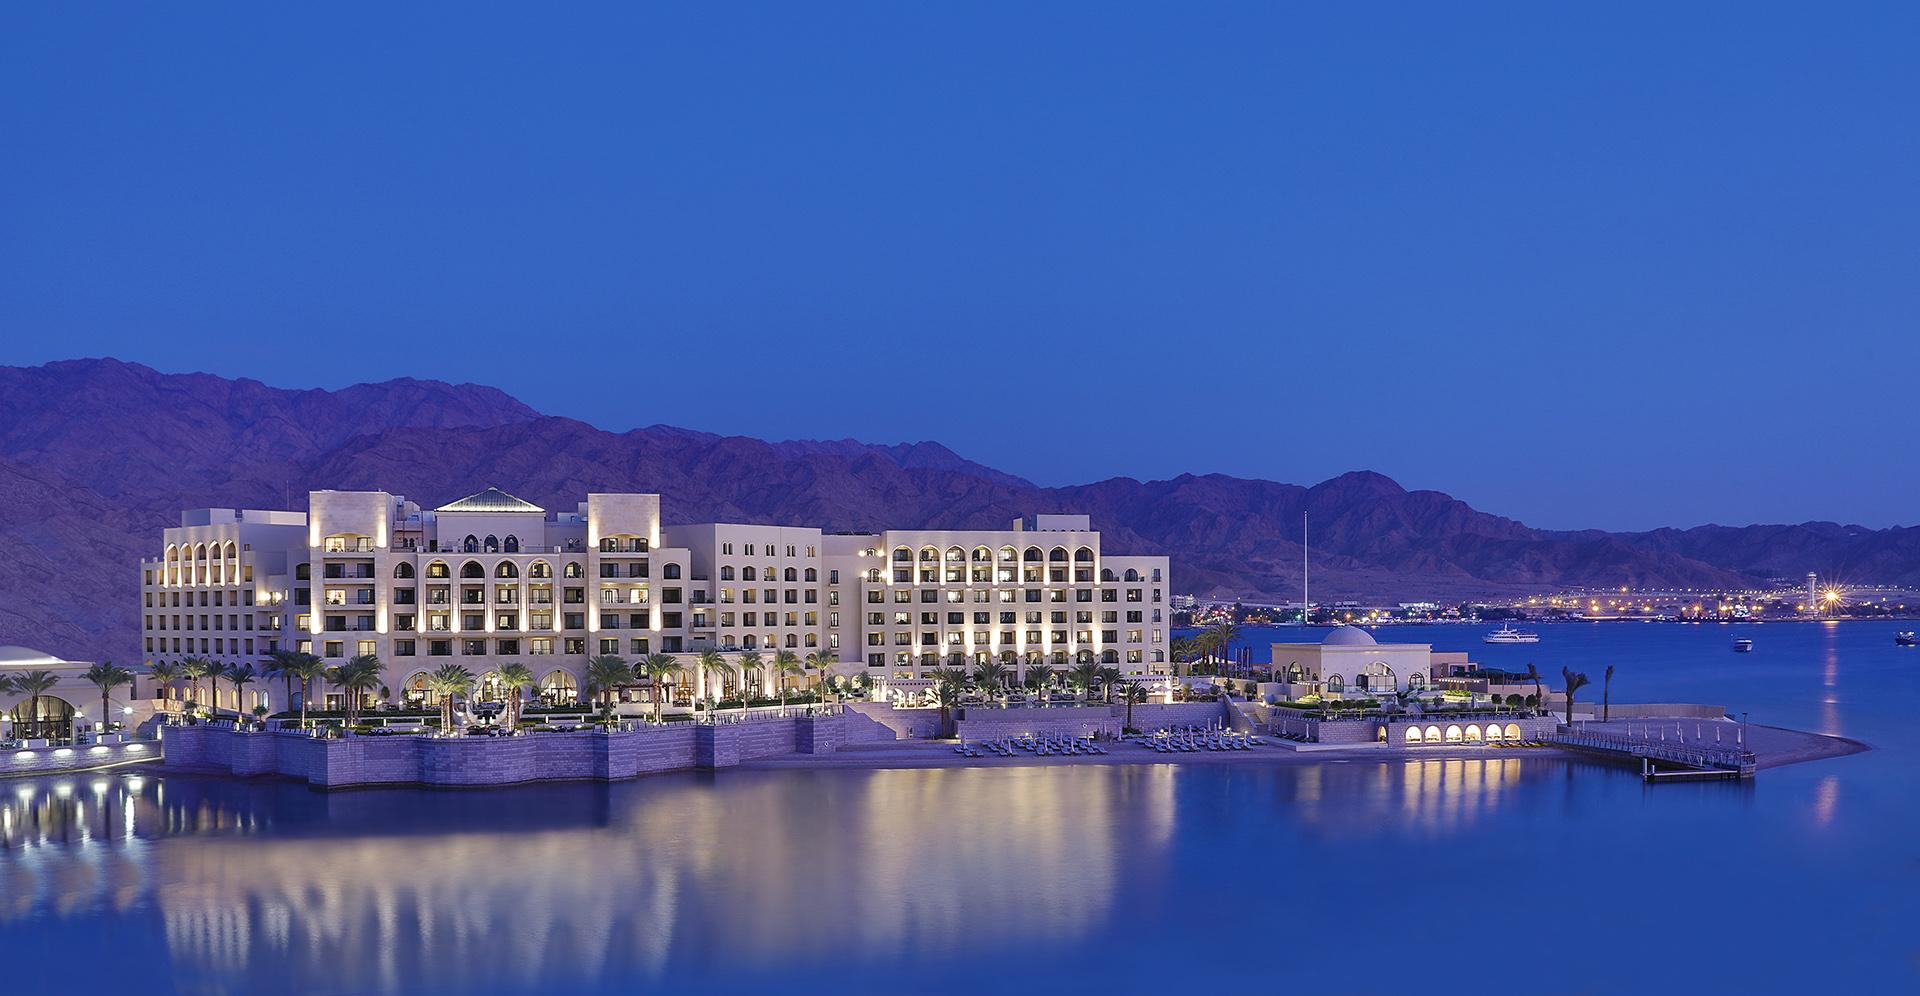 hotel_resort_photography47